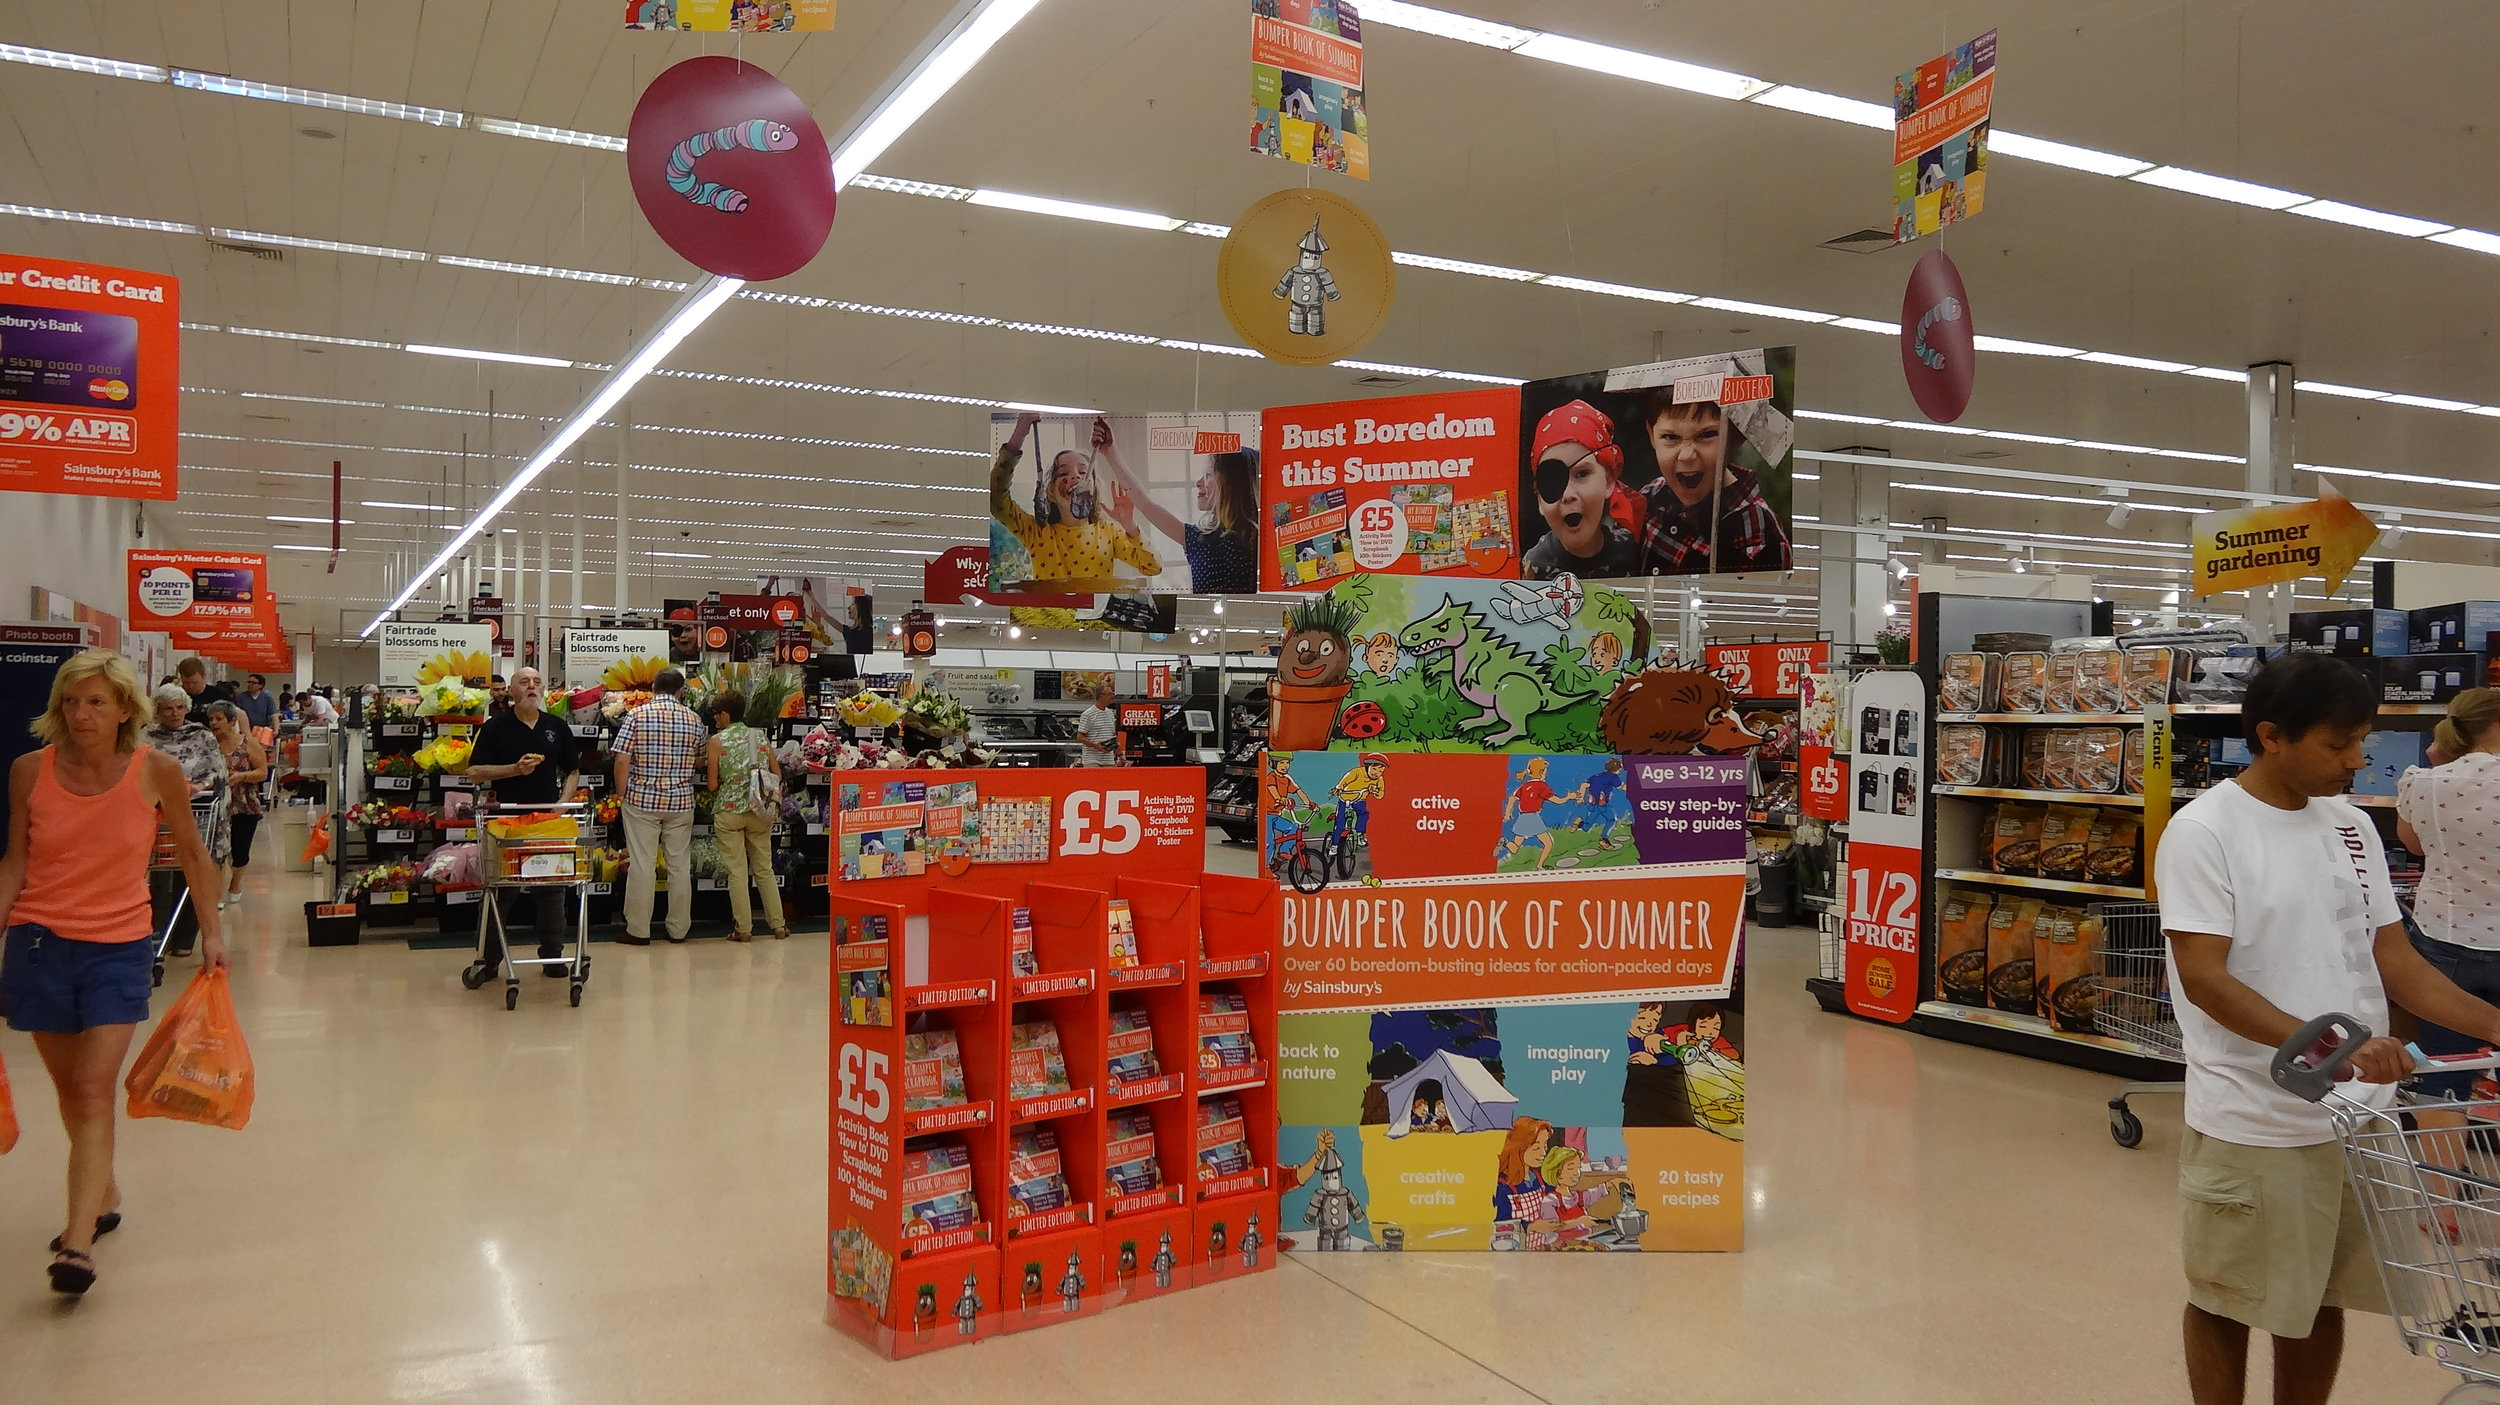 Sainsbury's - 'Bumper Book of Summer